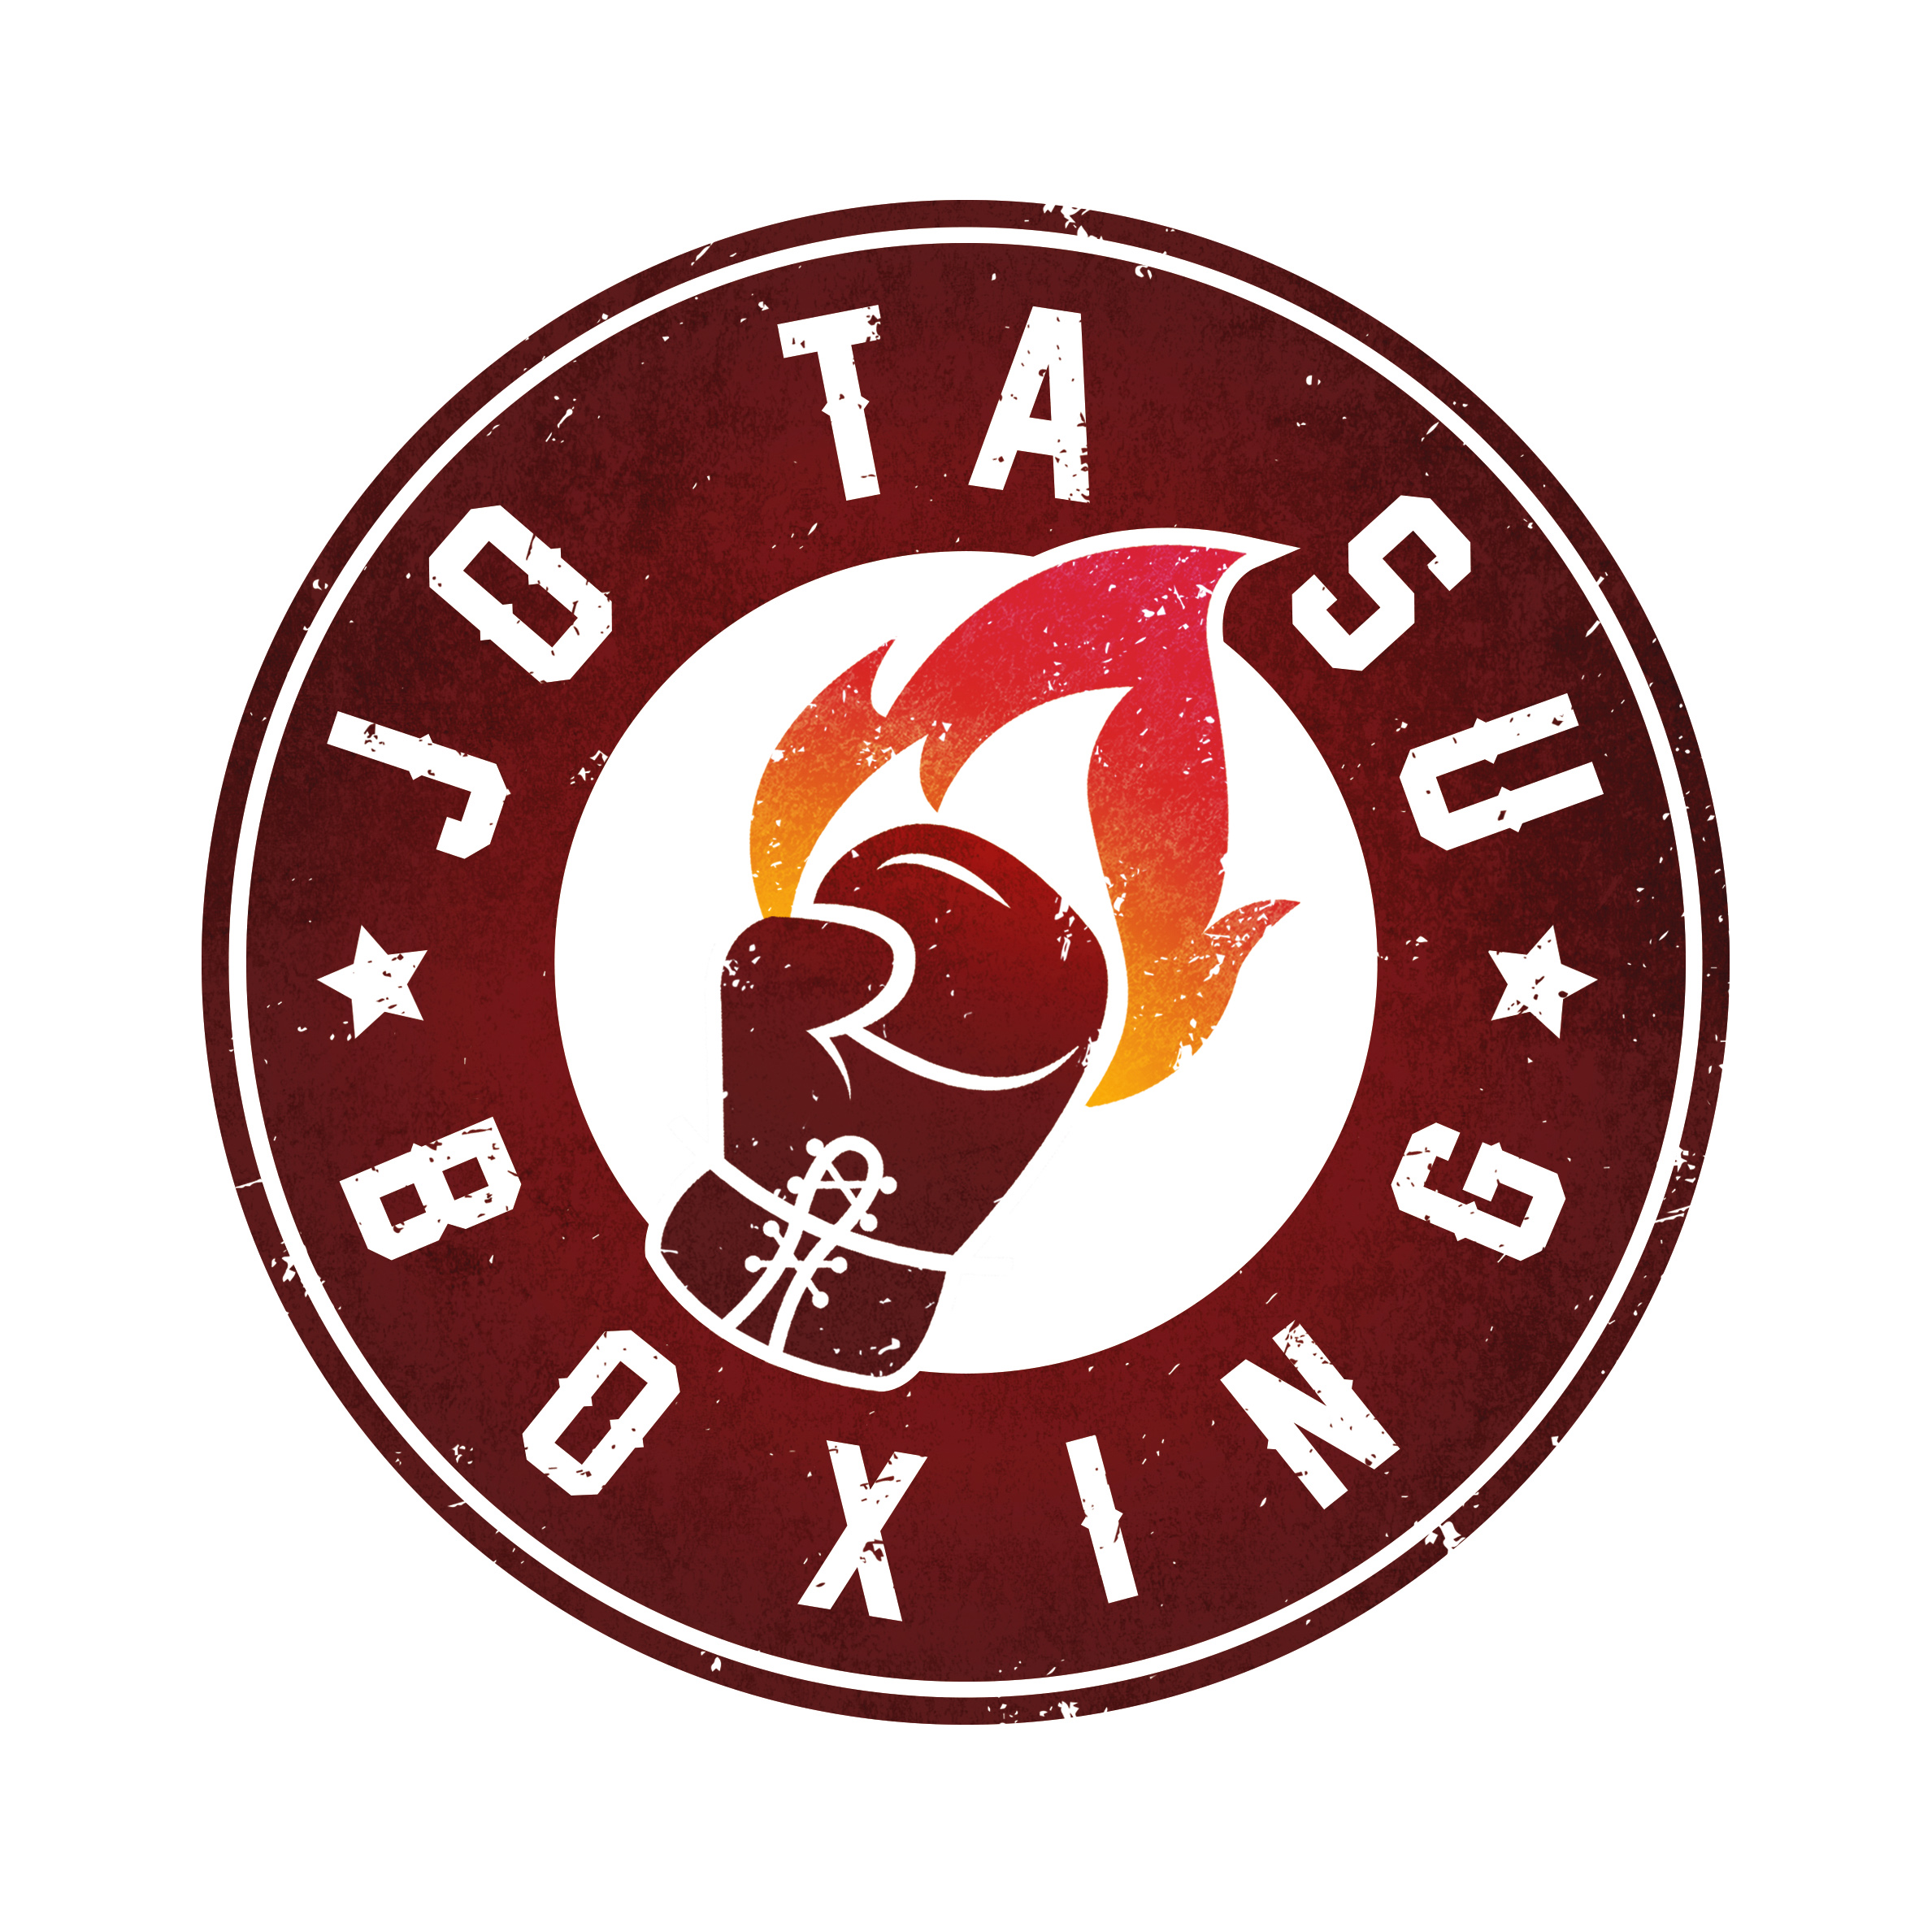 JO TA SU BOXING | Logotipoa